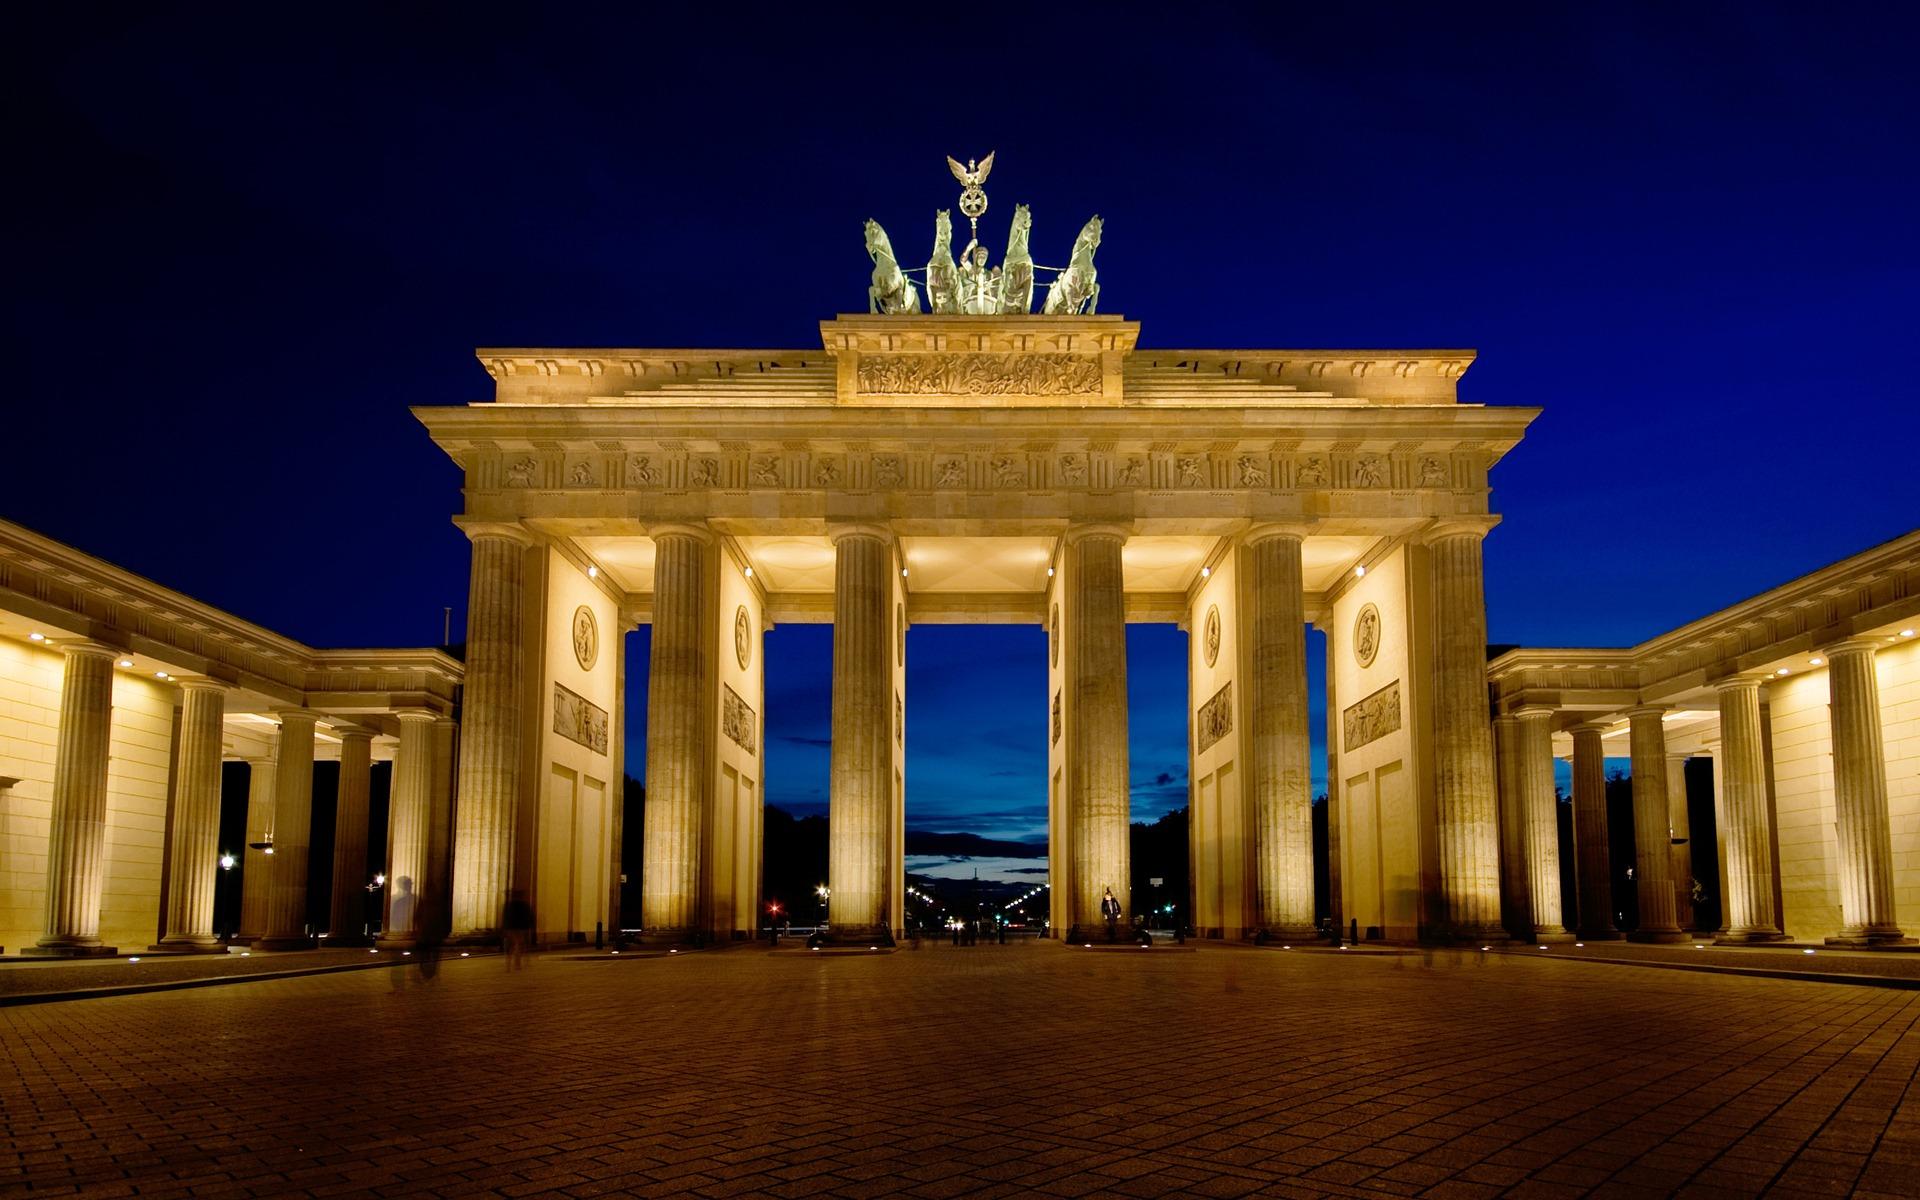 оперативно бранденбургские ворота в берлине фото давно